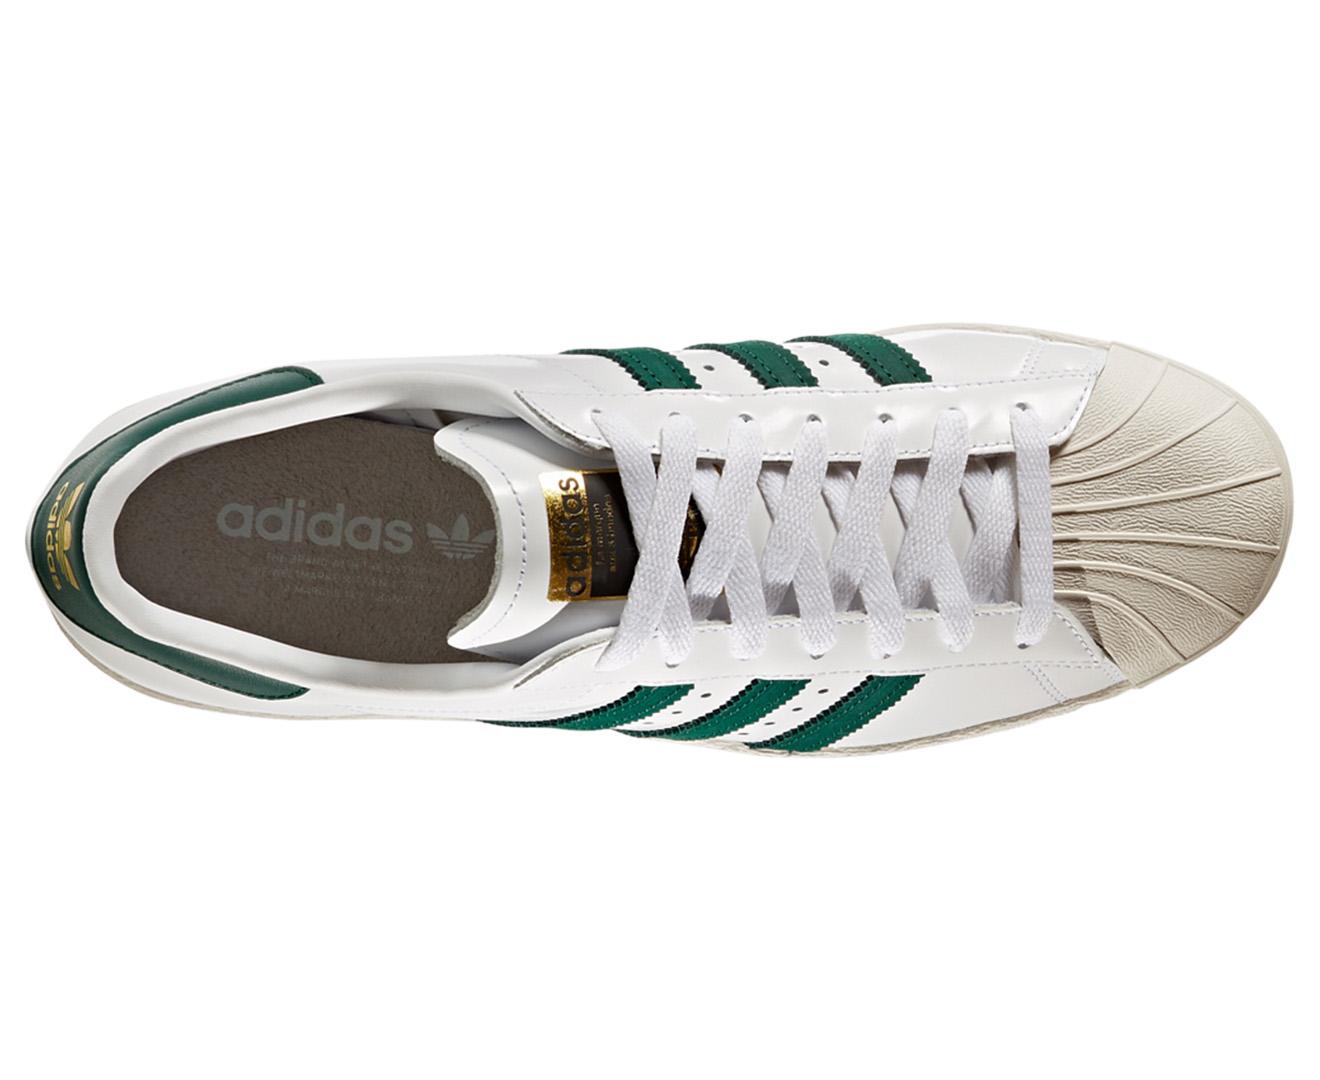 outlet store 989fc 8fc96 Adidas Originals Unisex Superstar 80s Shoe - White Green Gold Metallic    Catch.com.au